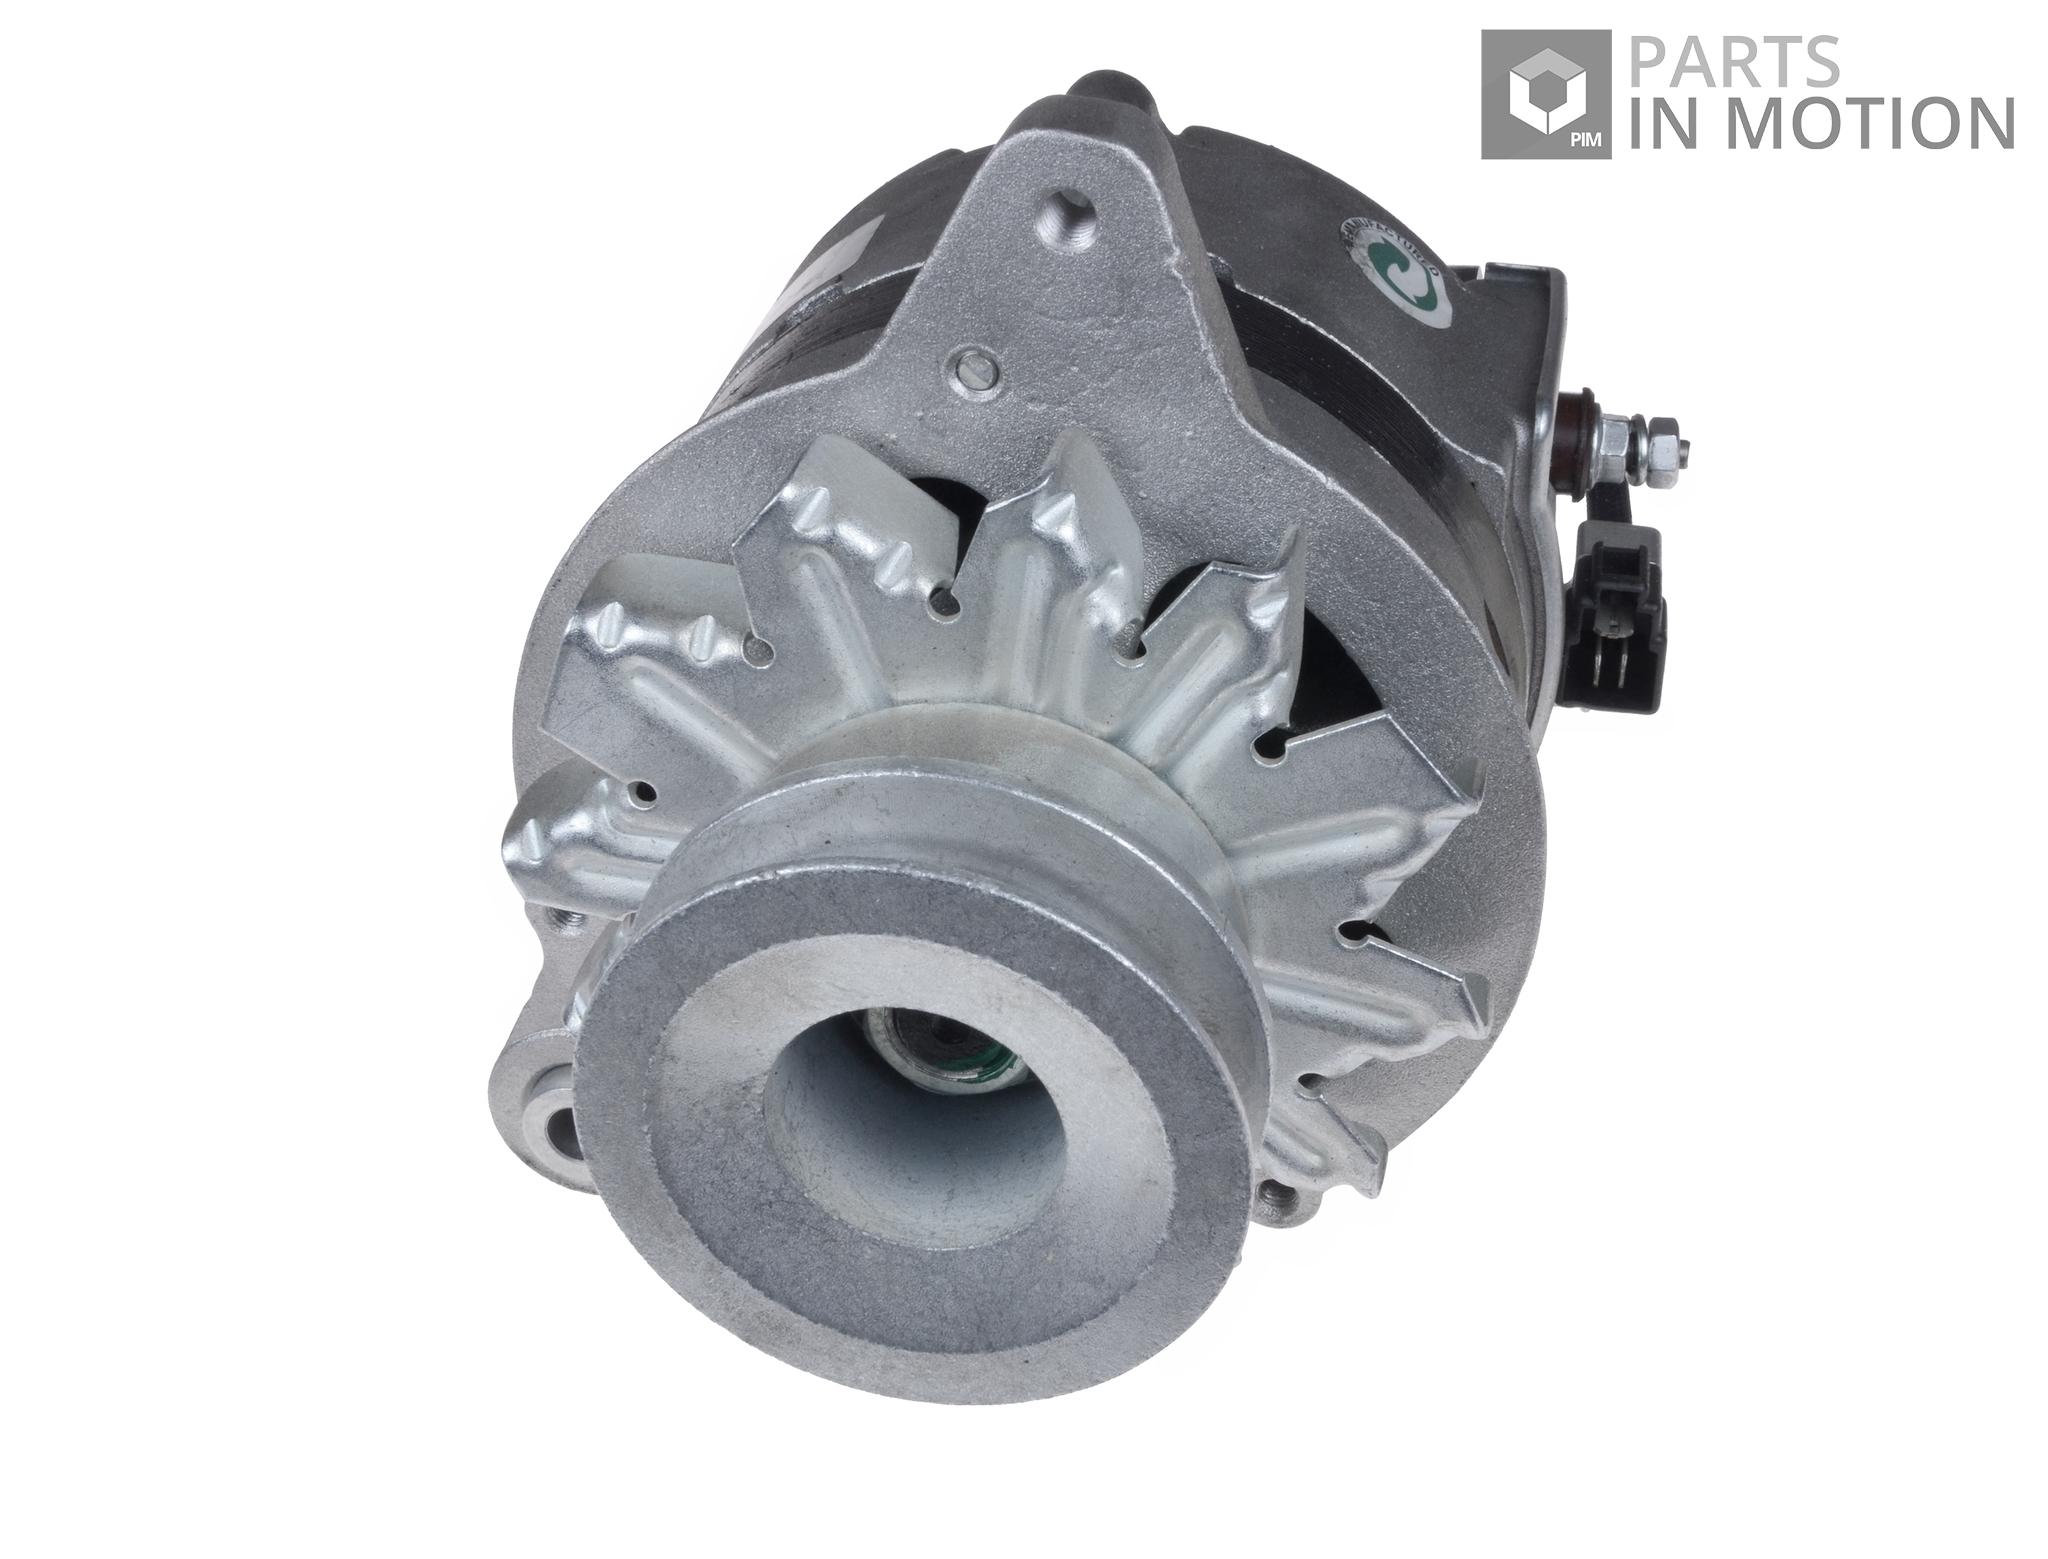 Alternator fits daihatsu fourtrak 28d 84 to 98 adl 2703087605 blue print alternator add61117 malvernweather Choice Image